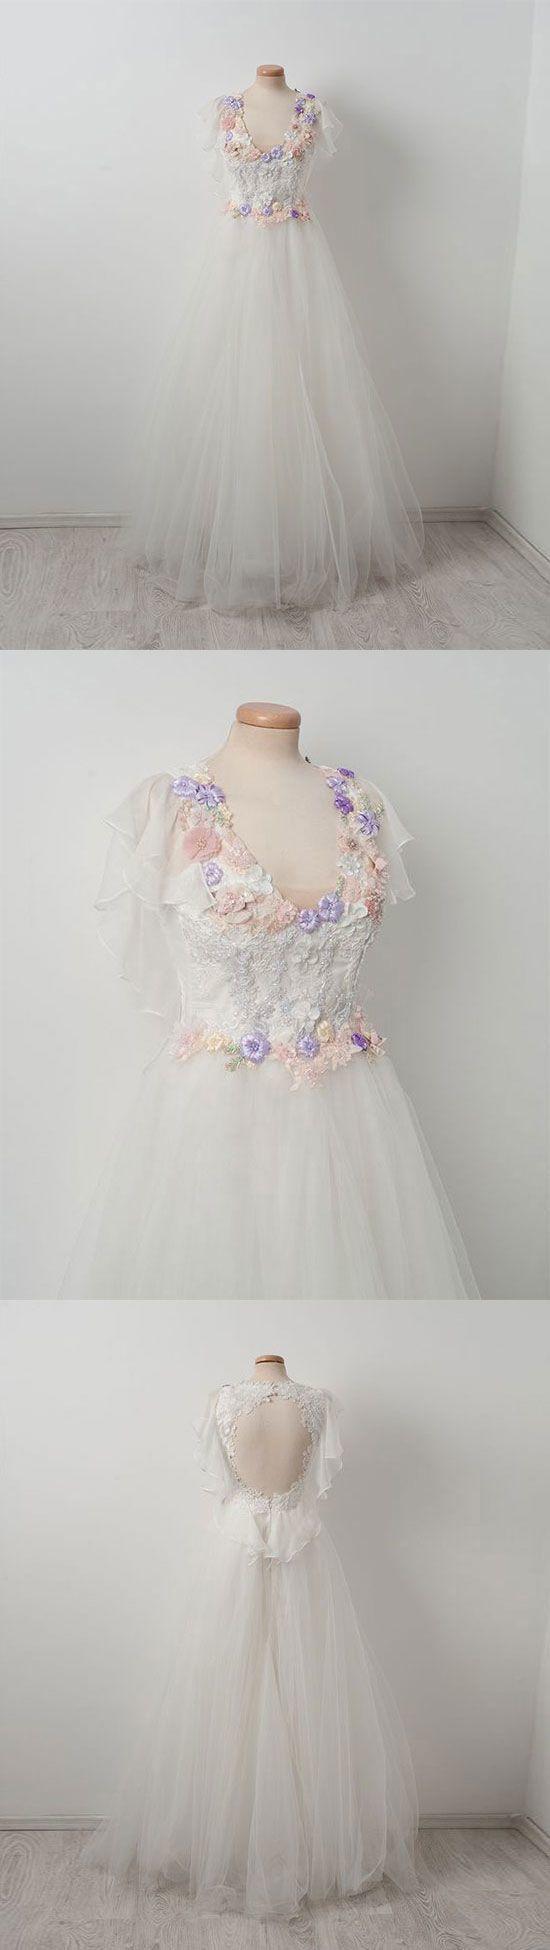 Elegant tulle lace applique white long prom dress, white evening dress